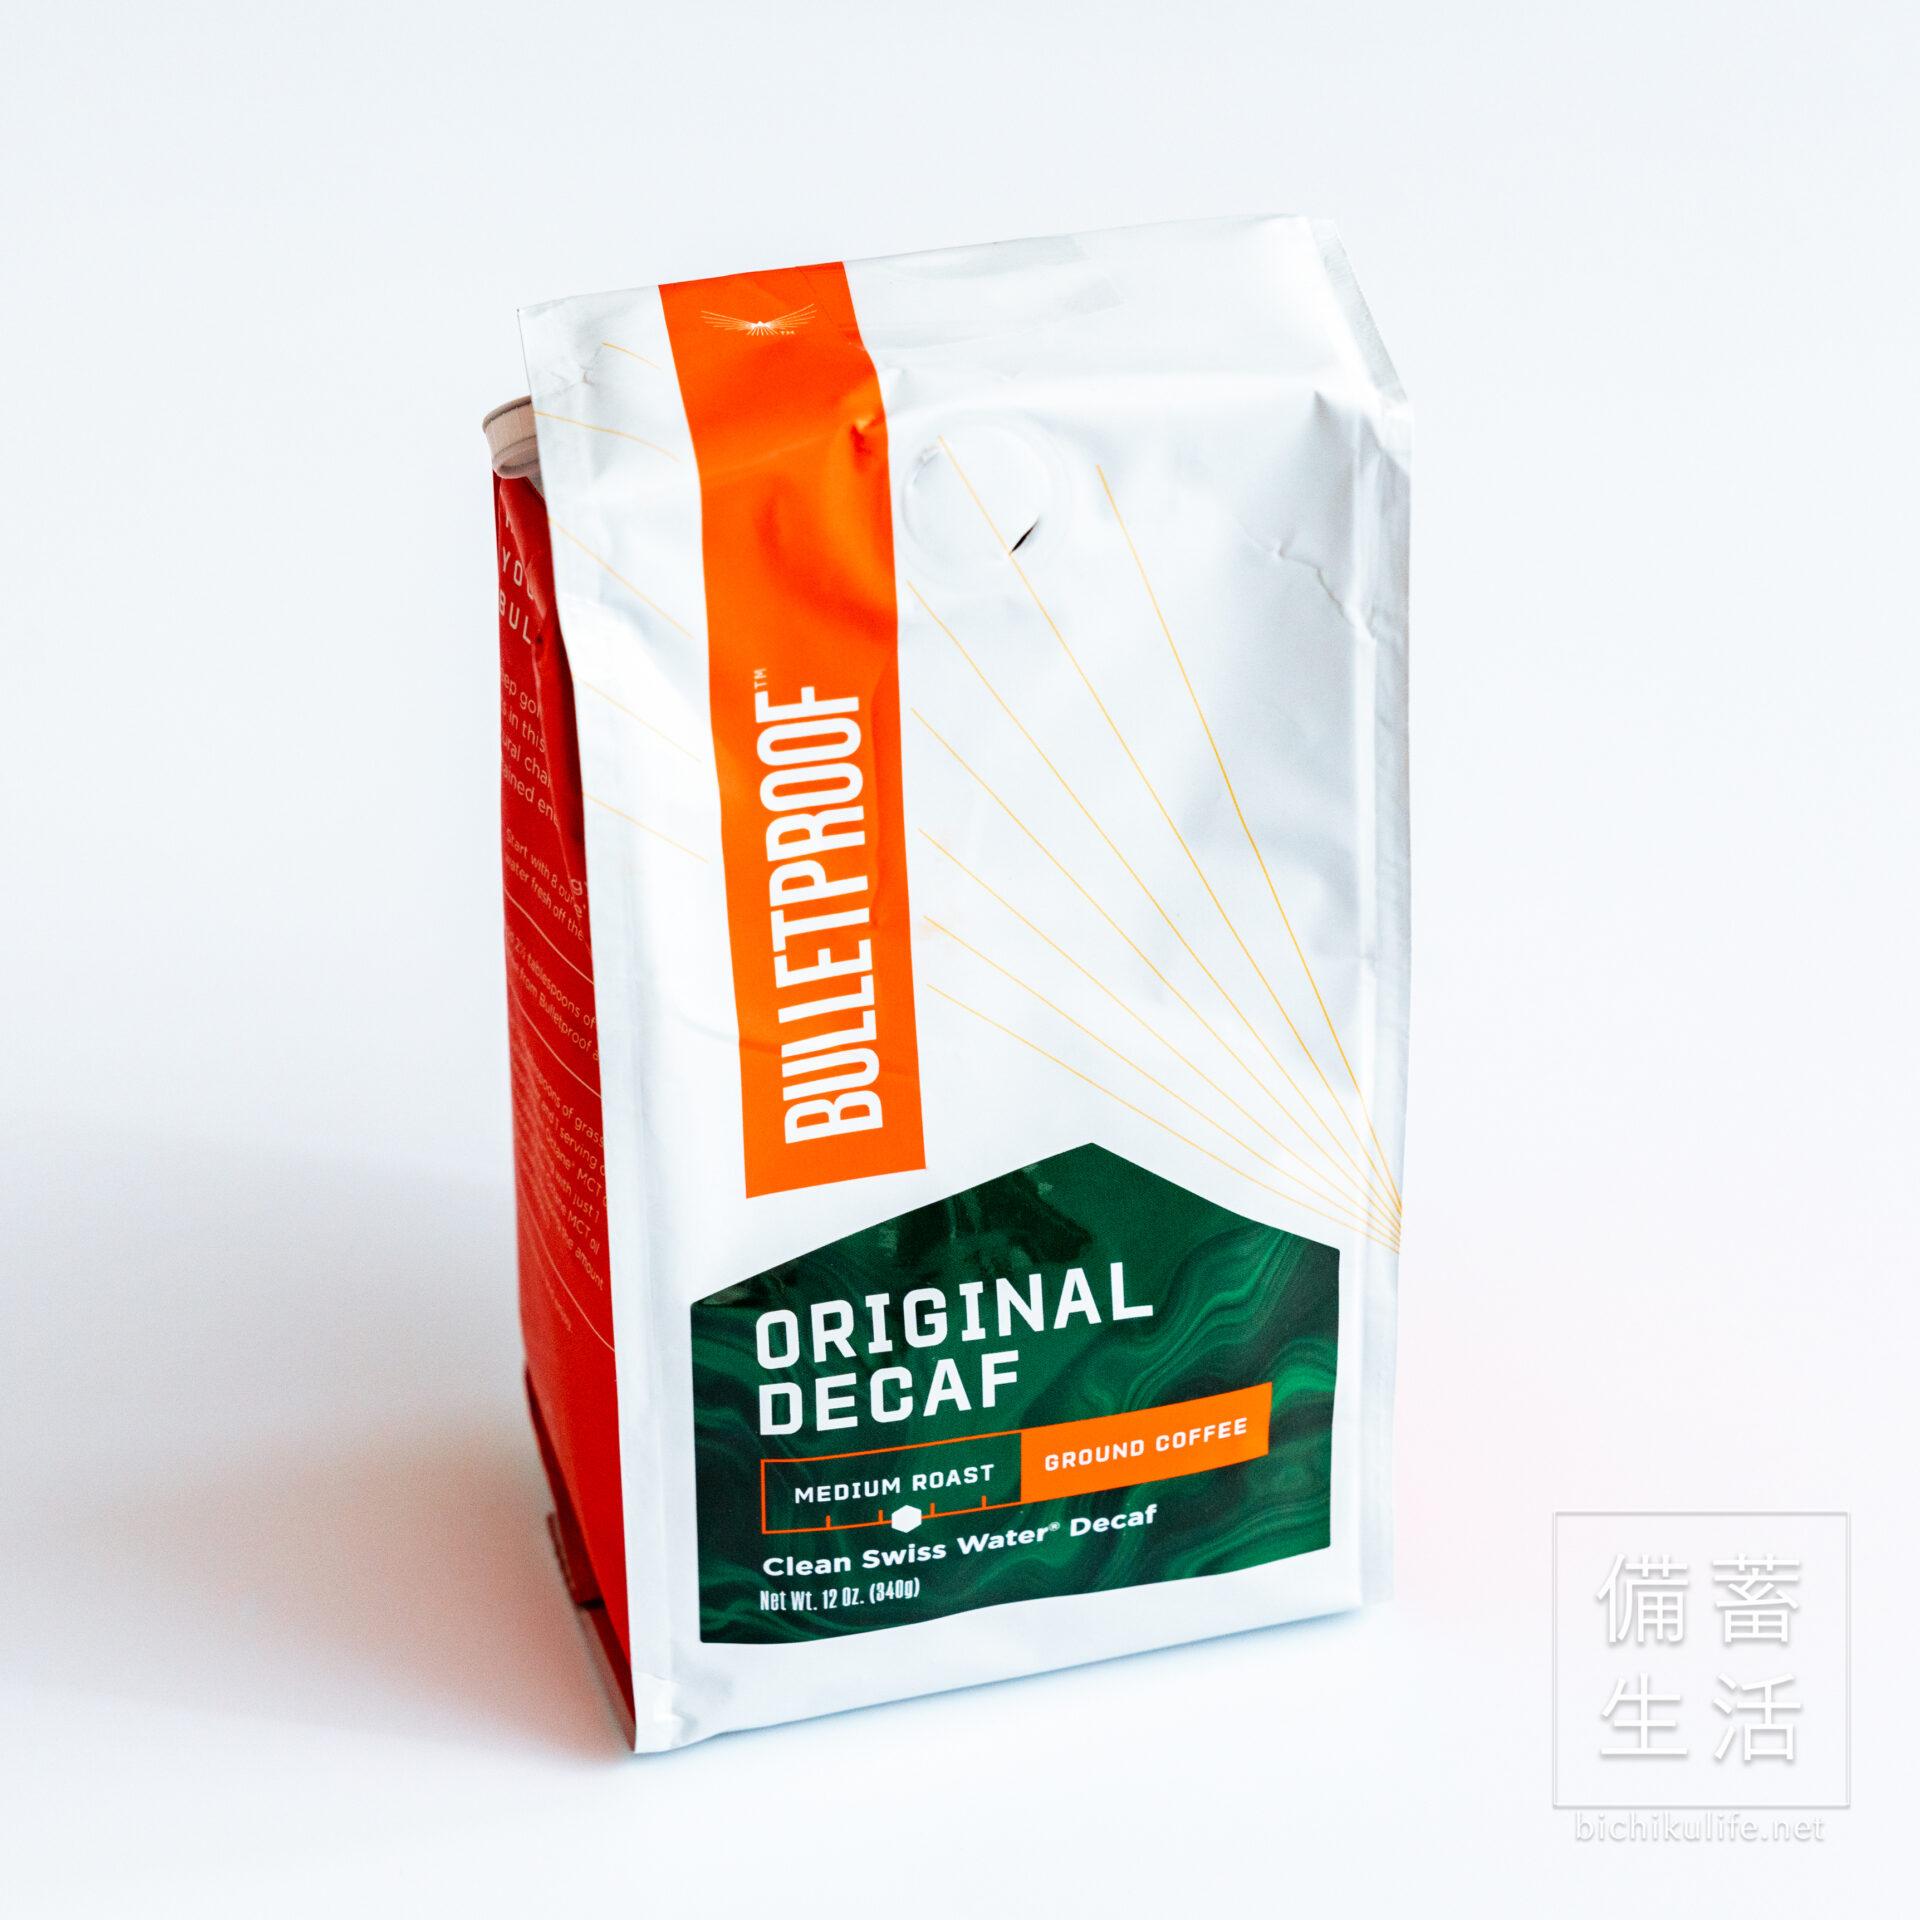 Bulletproofの防弾コーヒー Bulletproof Oridinal Decaf:Medium Roast